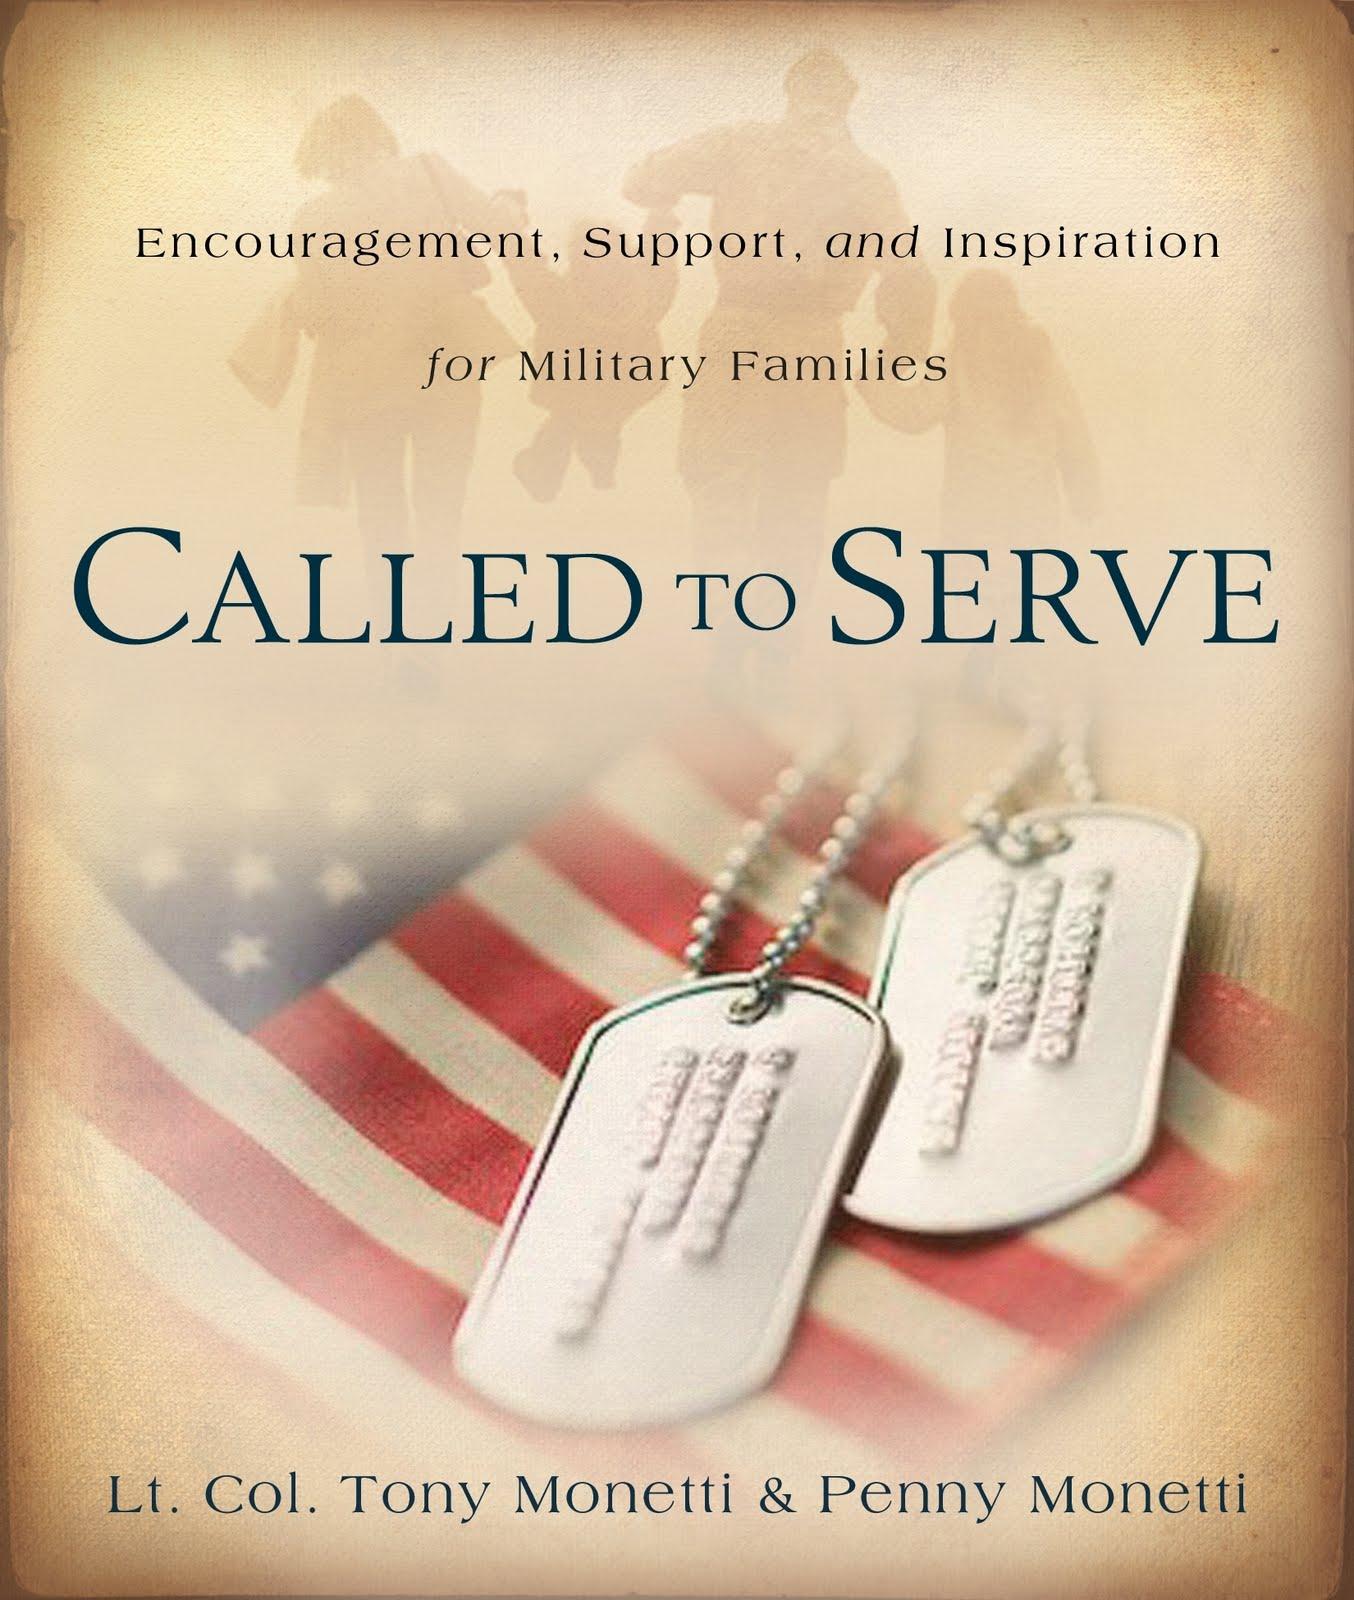 Homeless Veterans Quotes Inspirational. QuotesGram